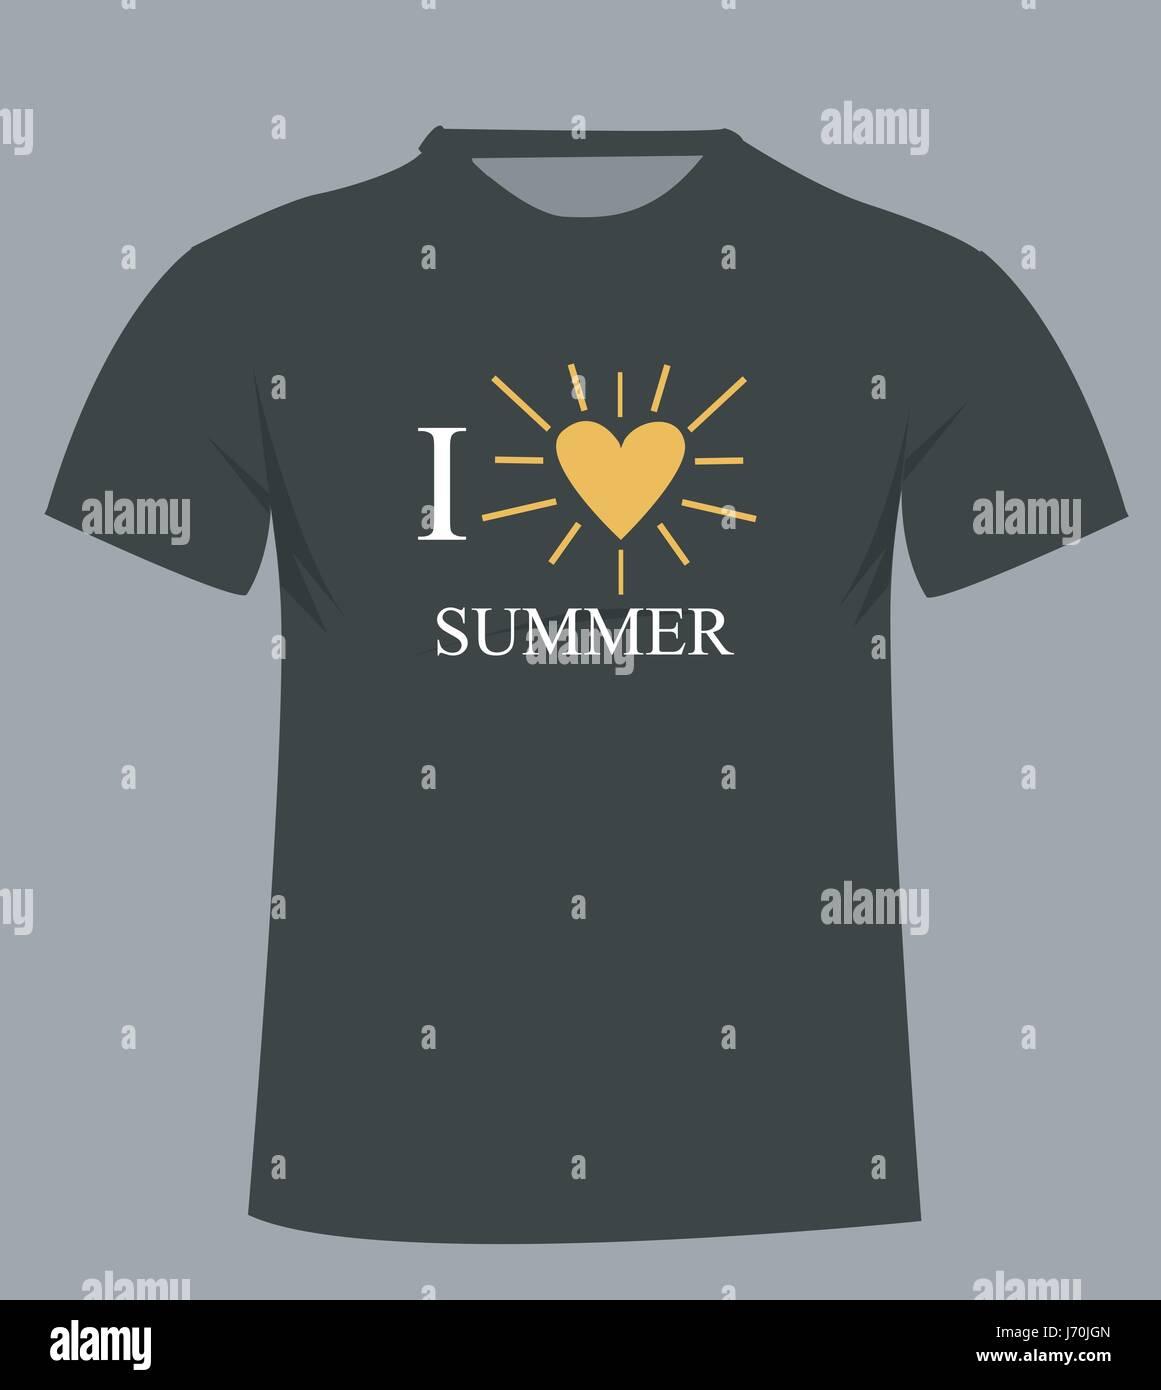 illustrator t shirt template